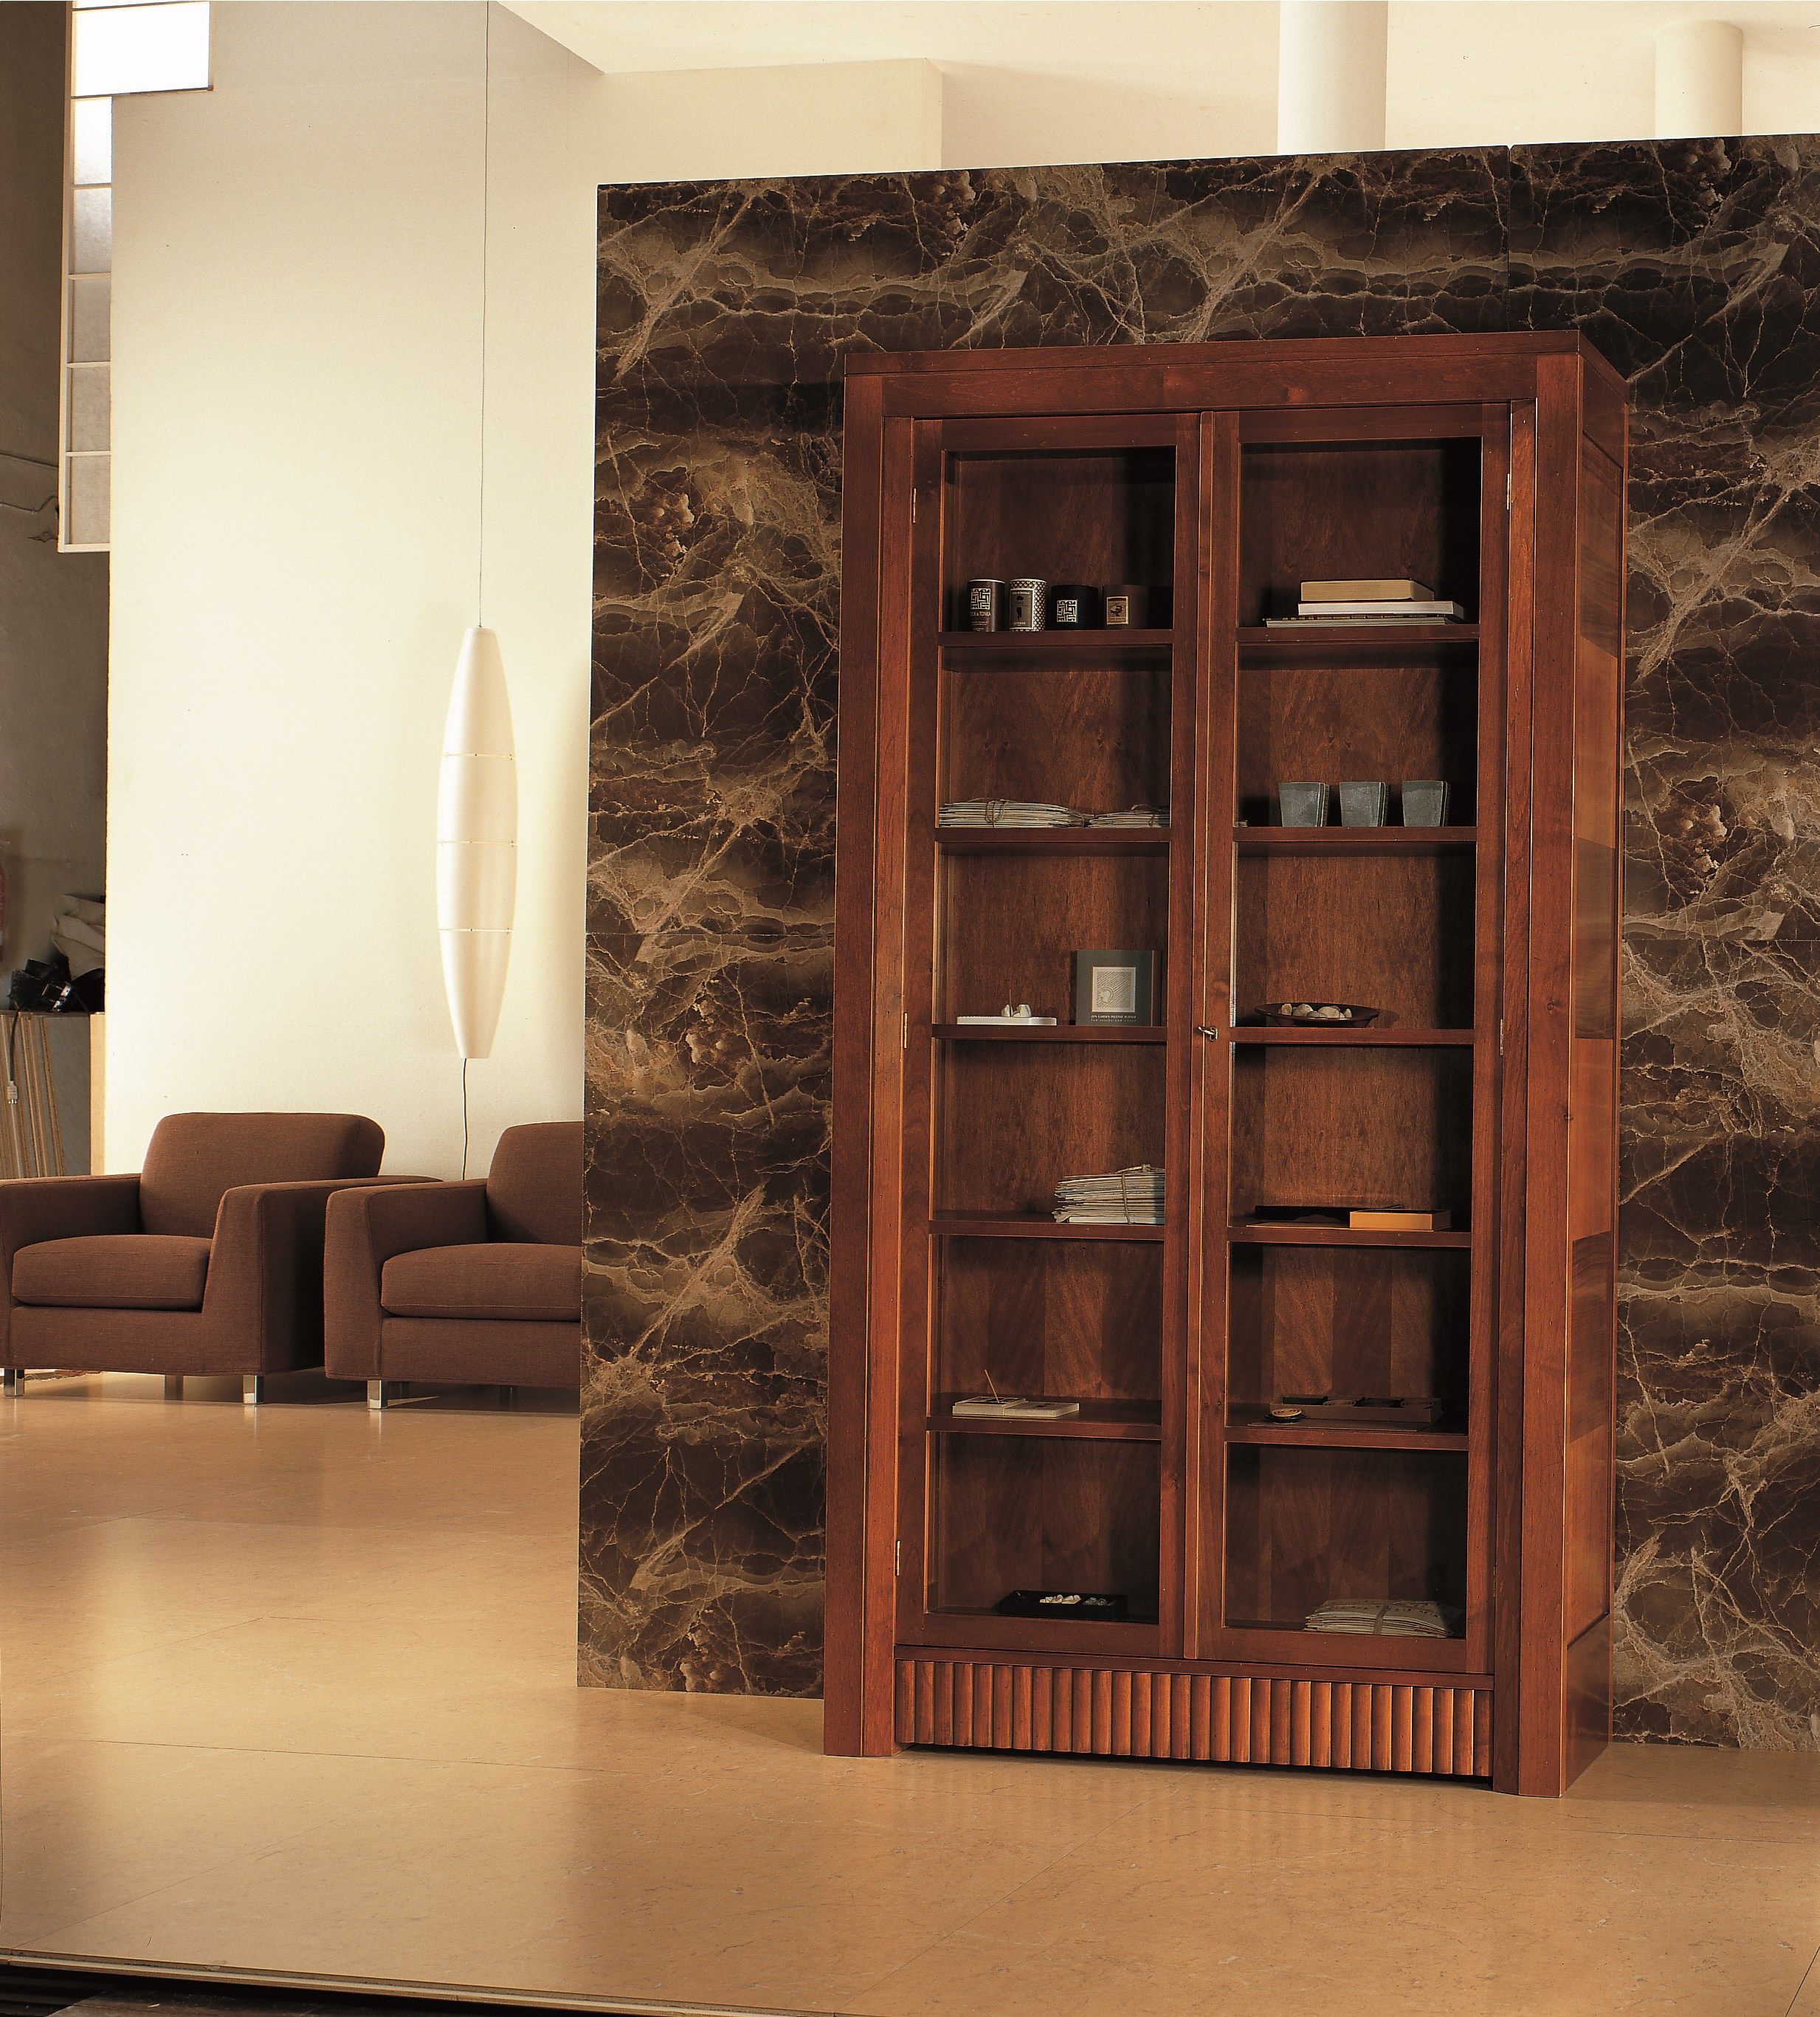 Scacchi by morelato dise o centro ricerche maam - Vitrinas de madera y vidrio ...